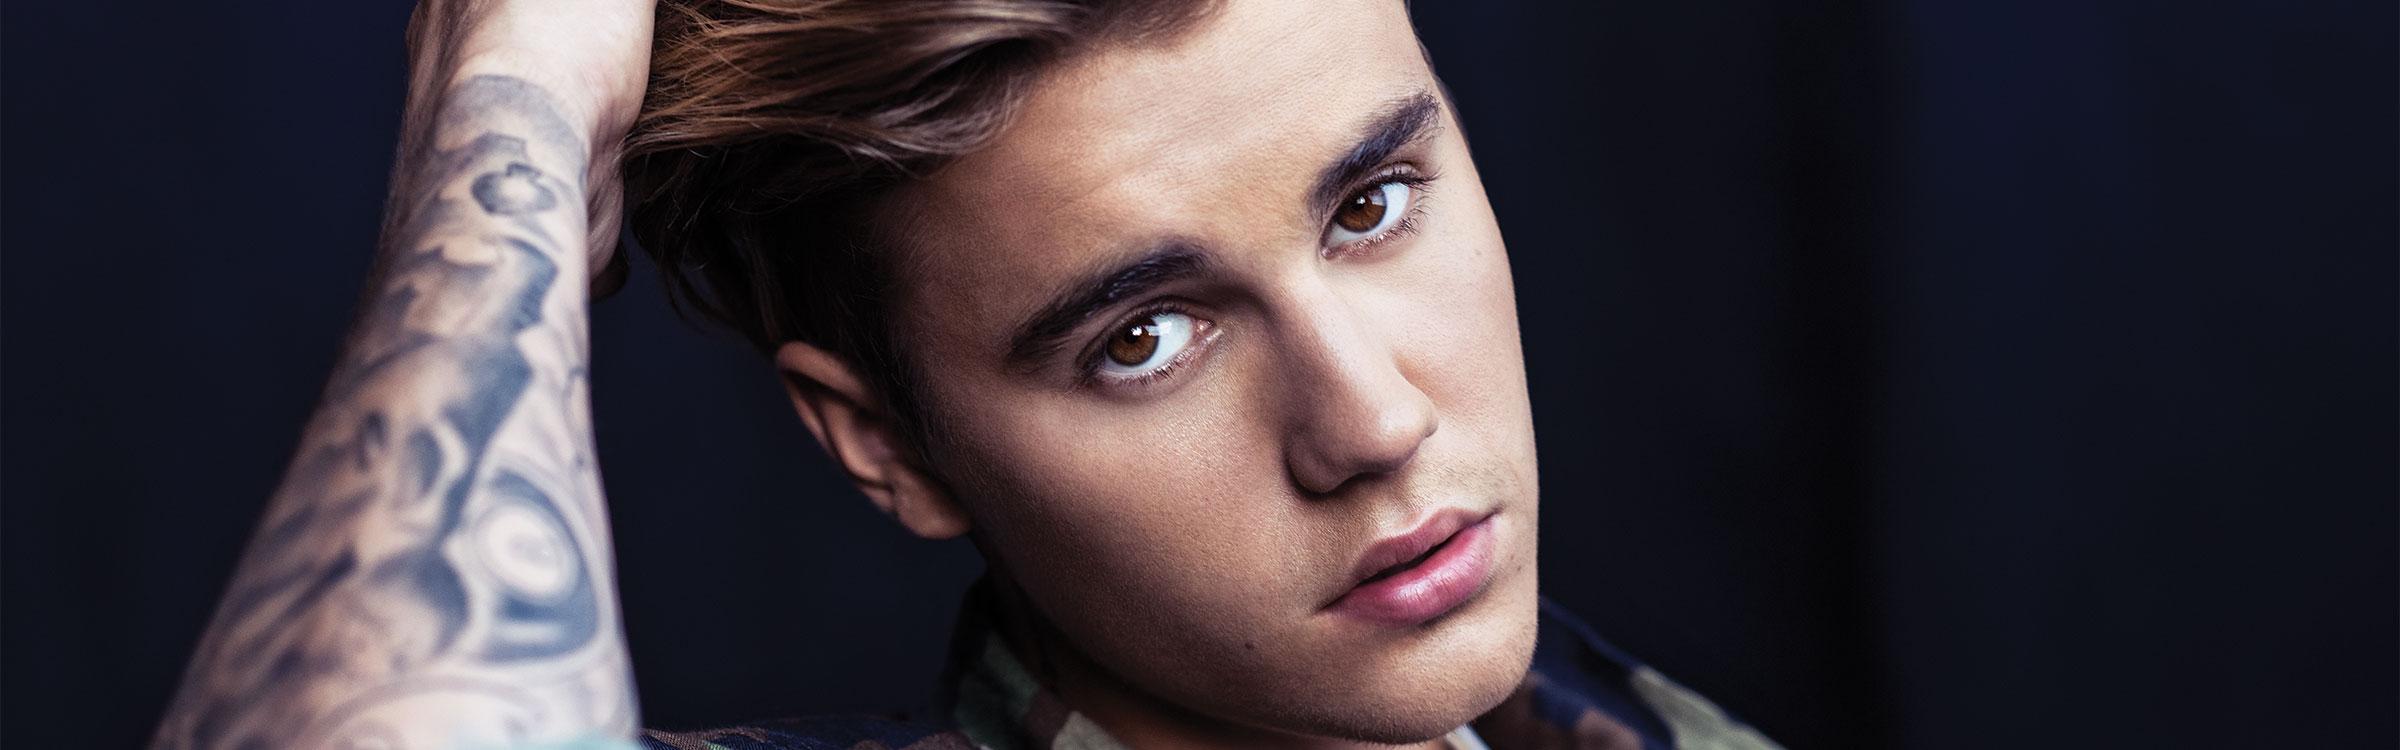 Bieber pagina